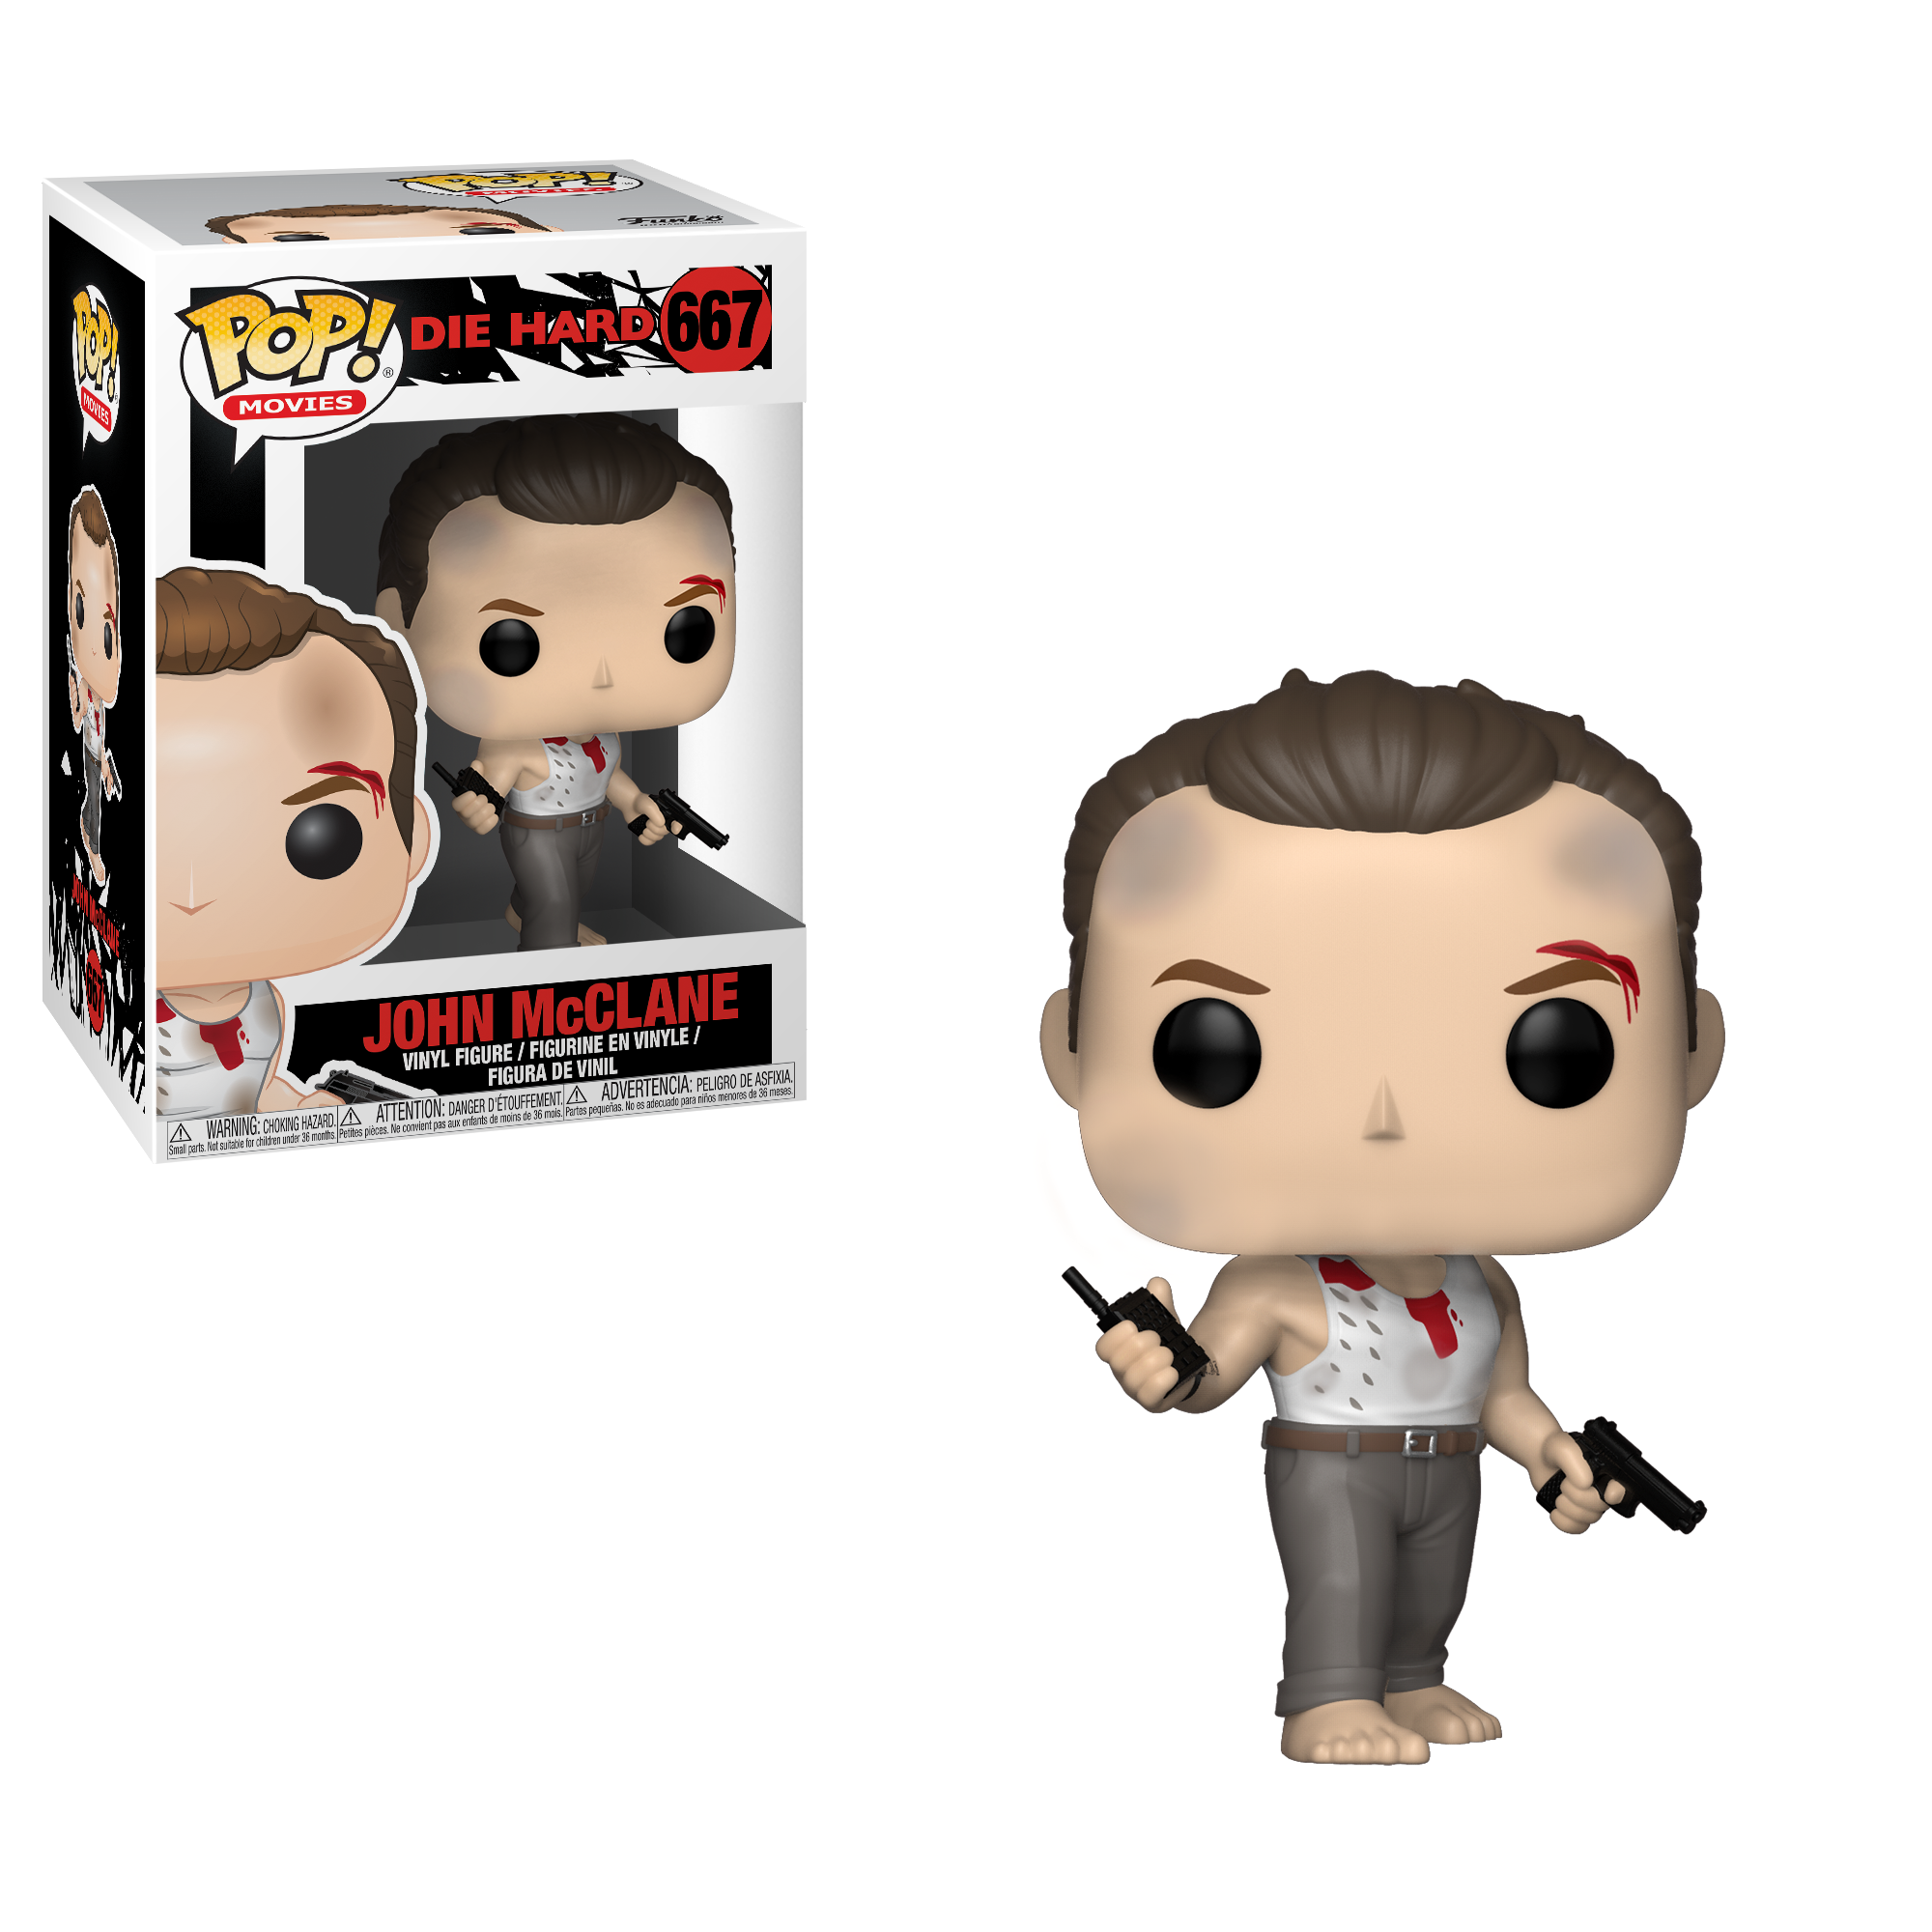 Funko POP! Movies: Die Hard - John McClane